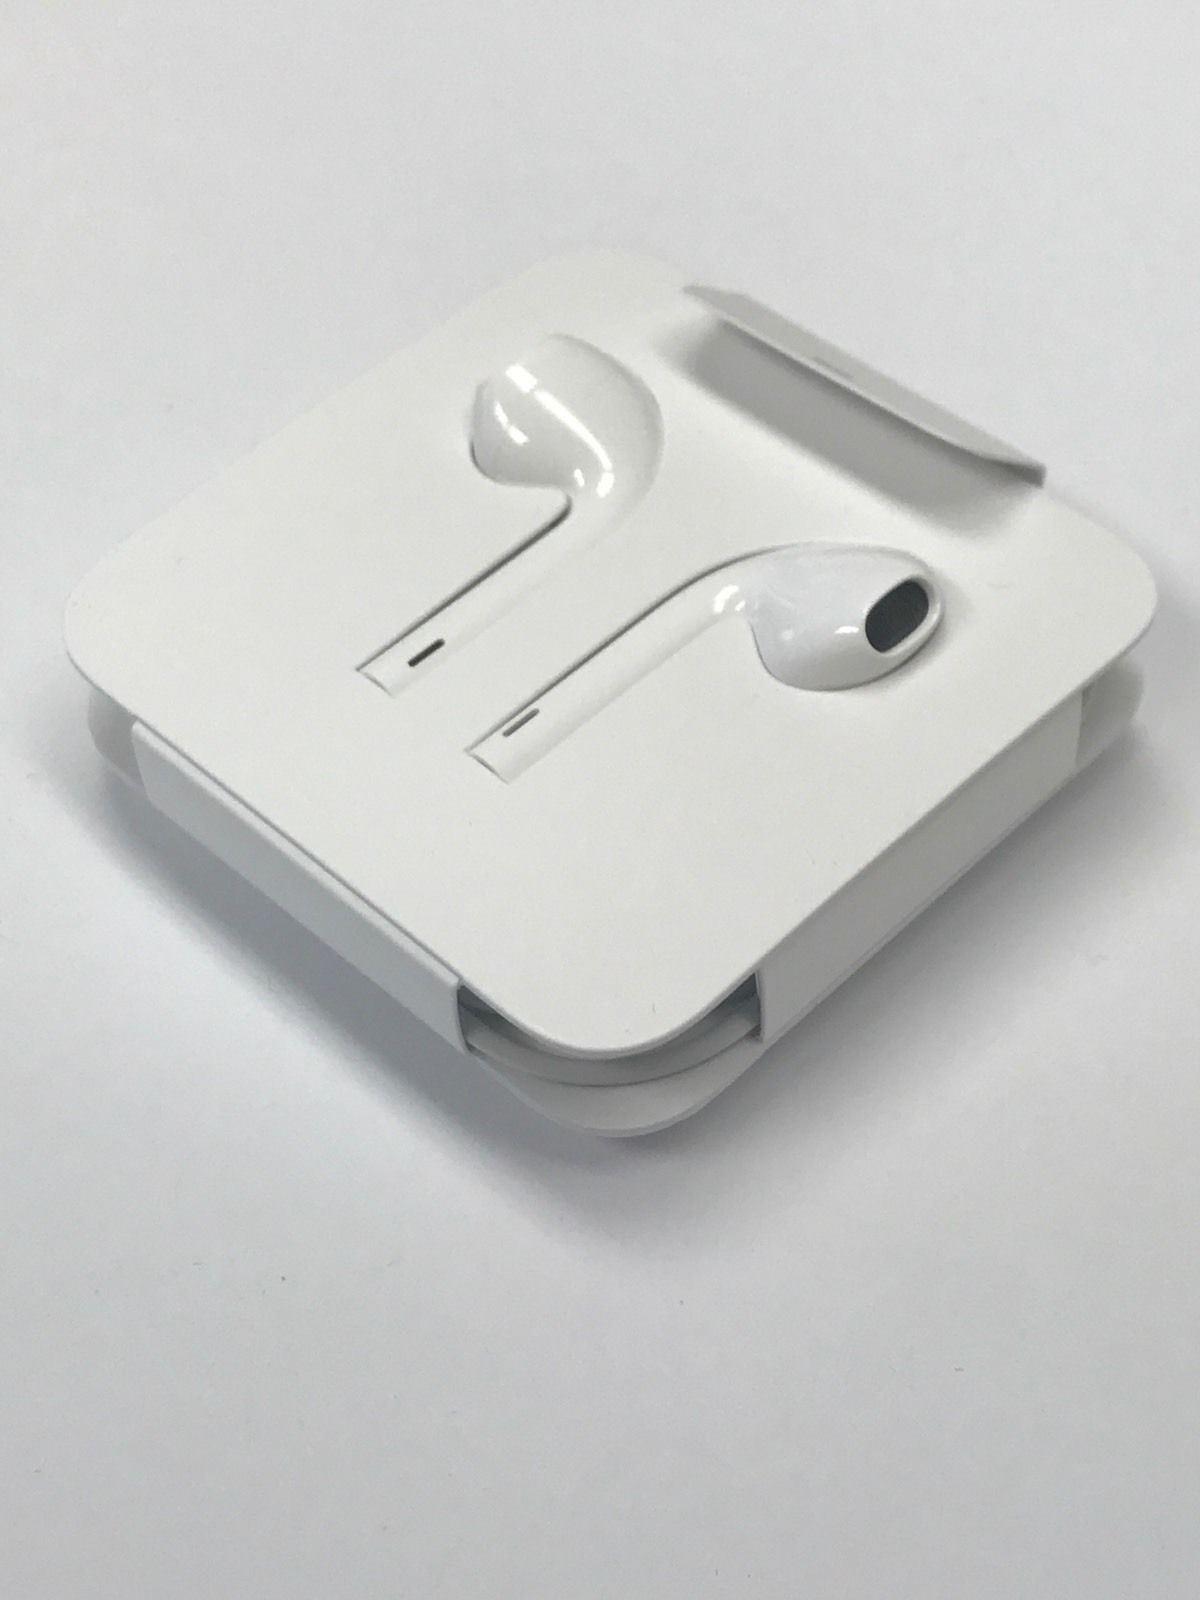 0376f3f402a Apple - Audifono EarPods Con Plug 3.5mm Originales MNHF2AM/A - Blanco |  Juntoz.com